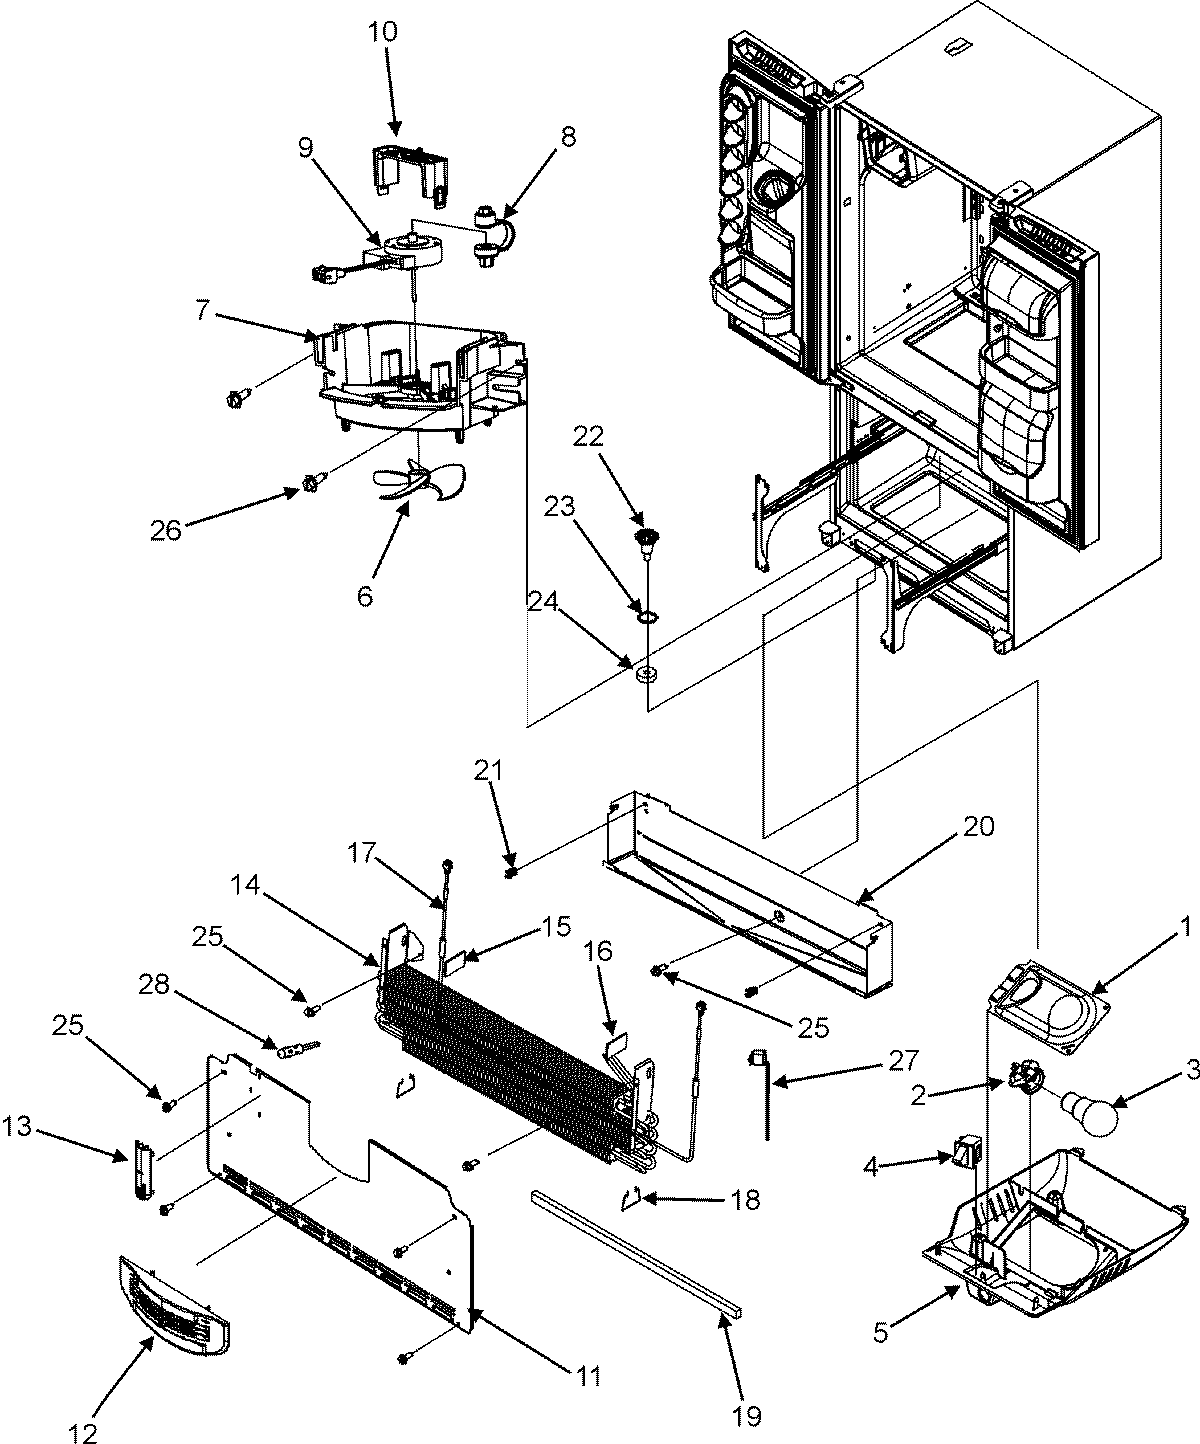 hight resolution of defrosting a maytag refrigerator